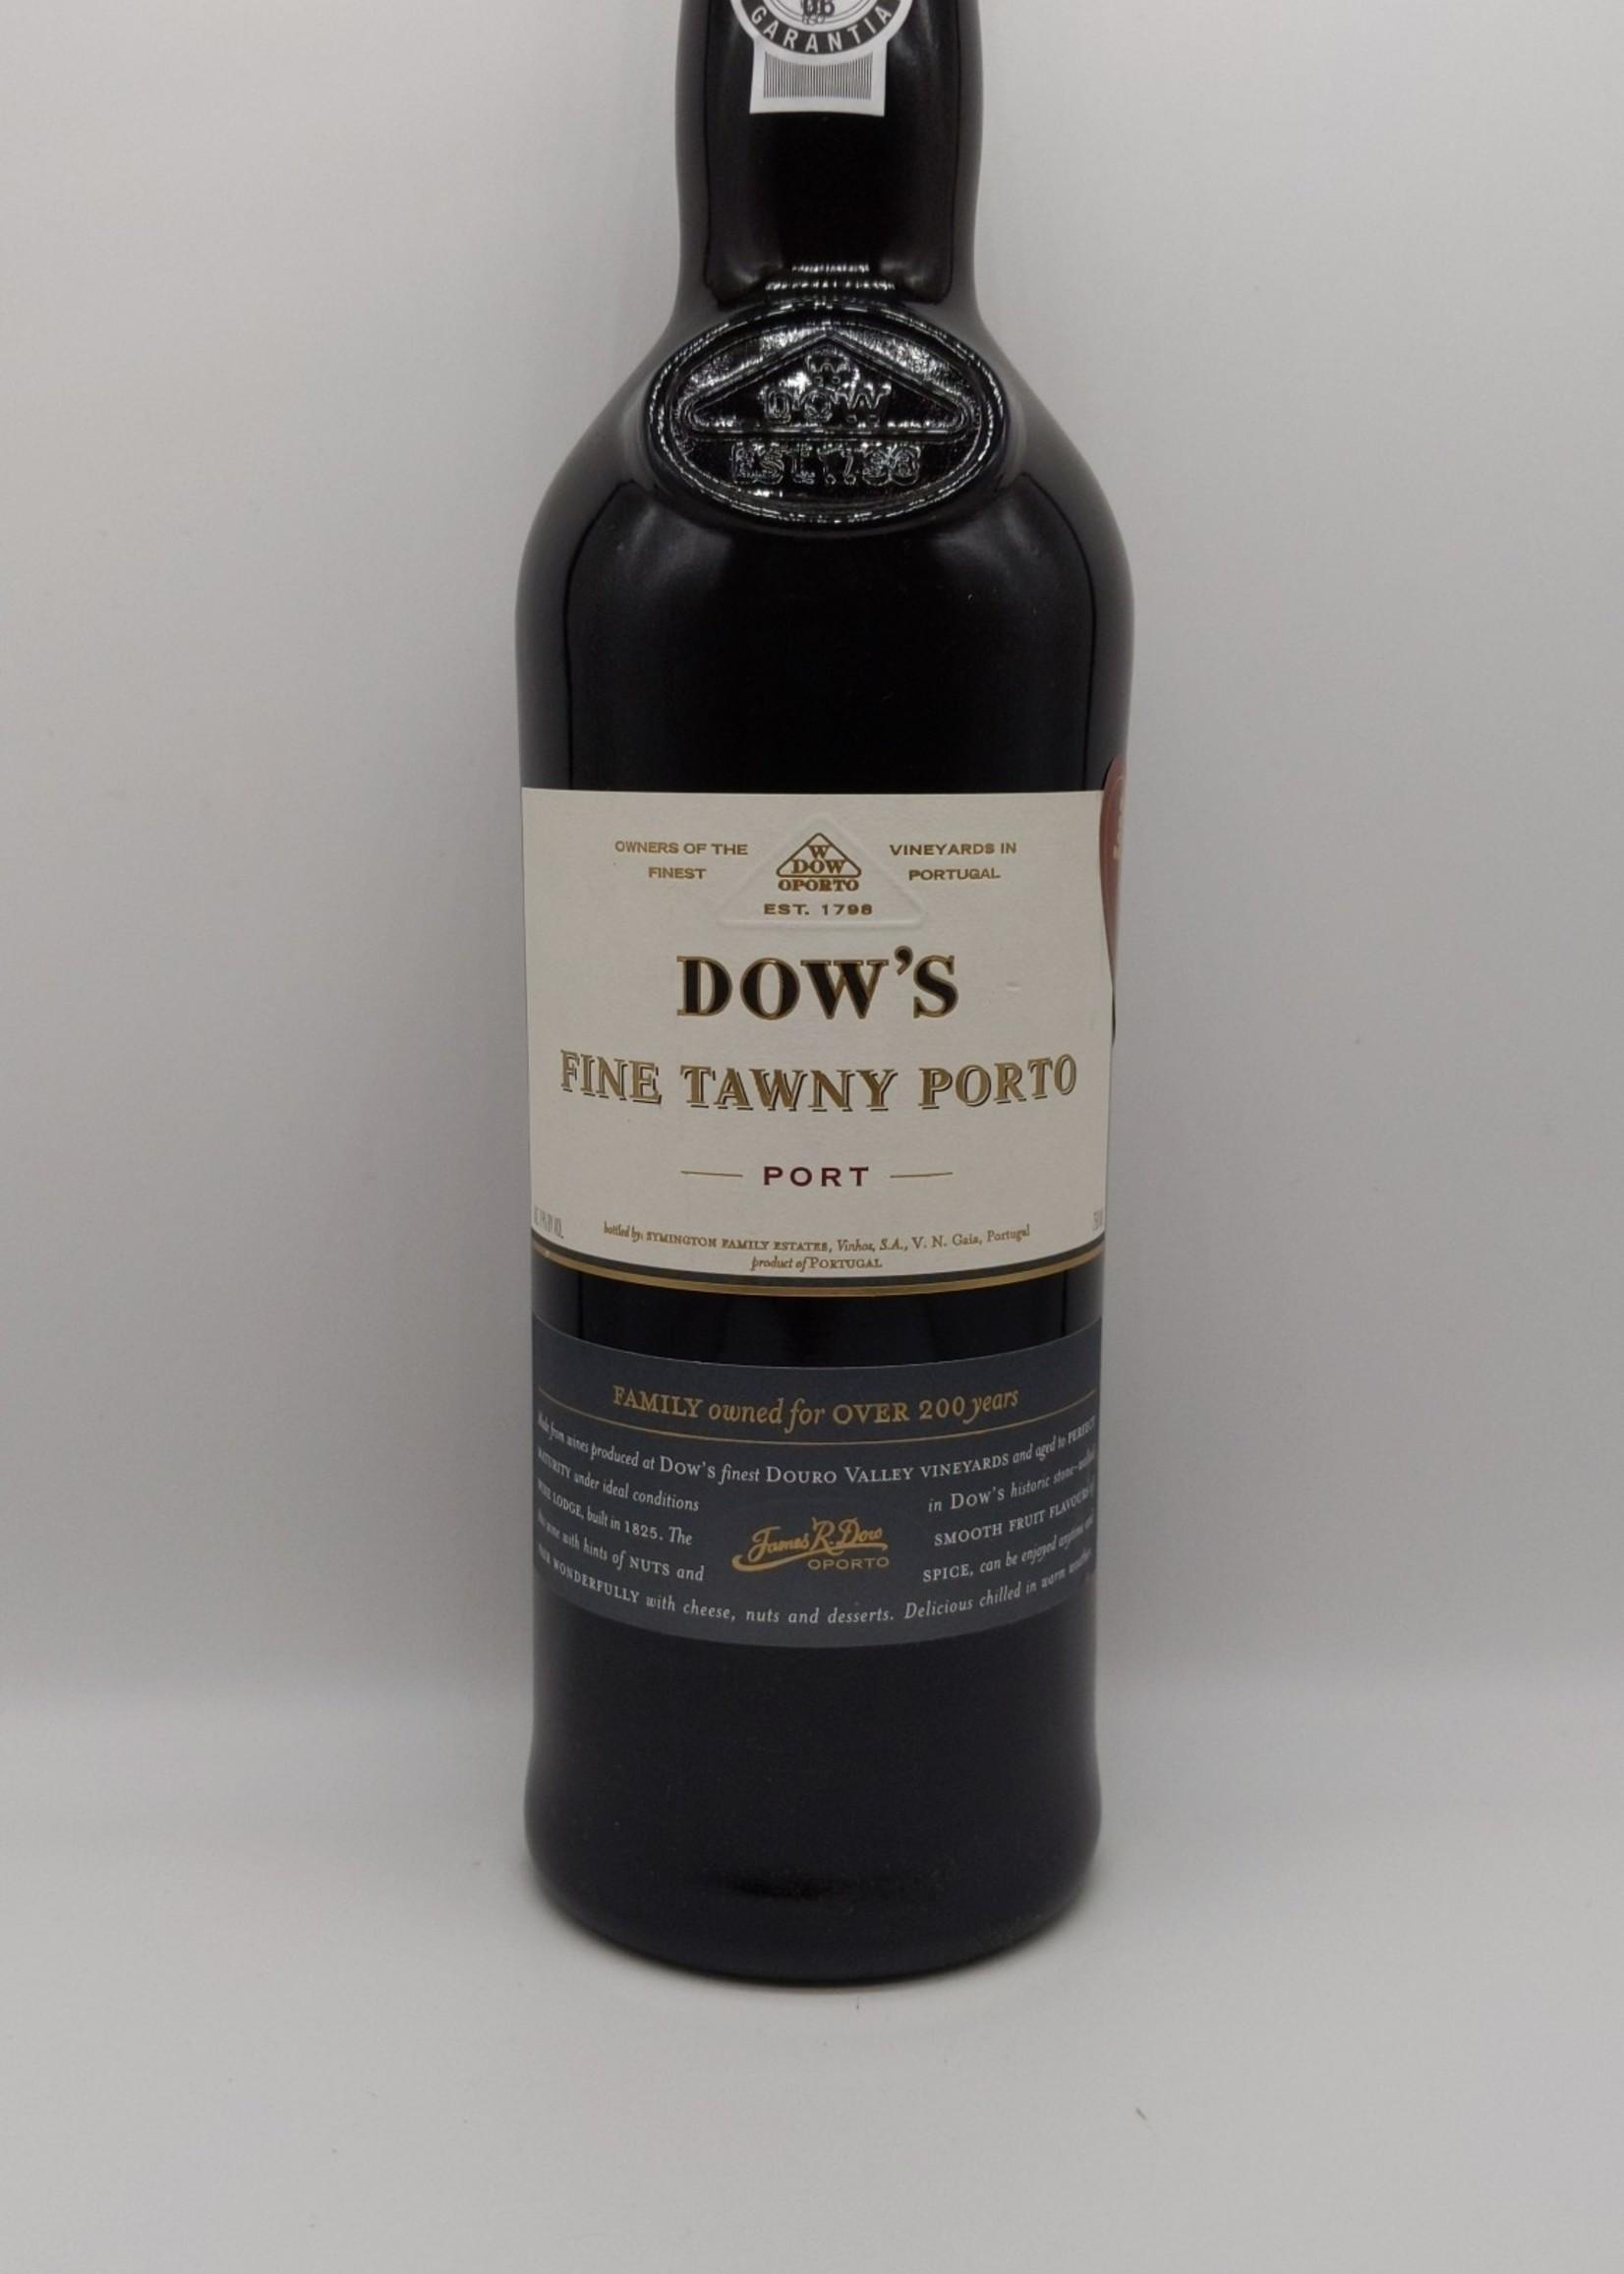 NV DOWS FINE TAWNY PORT 750ml